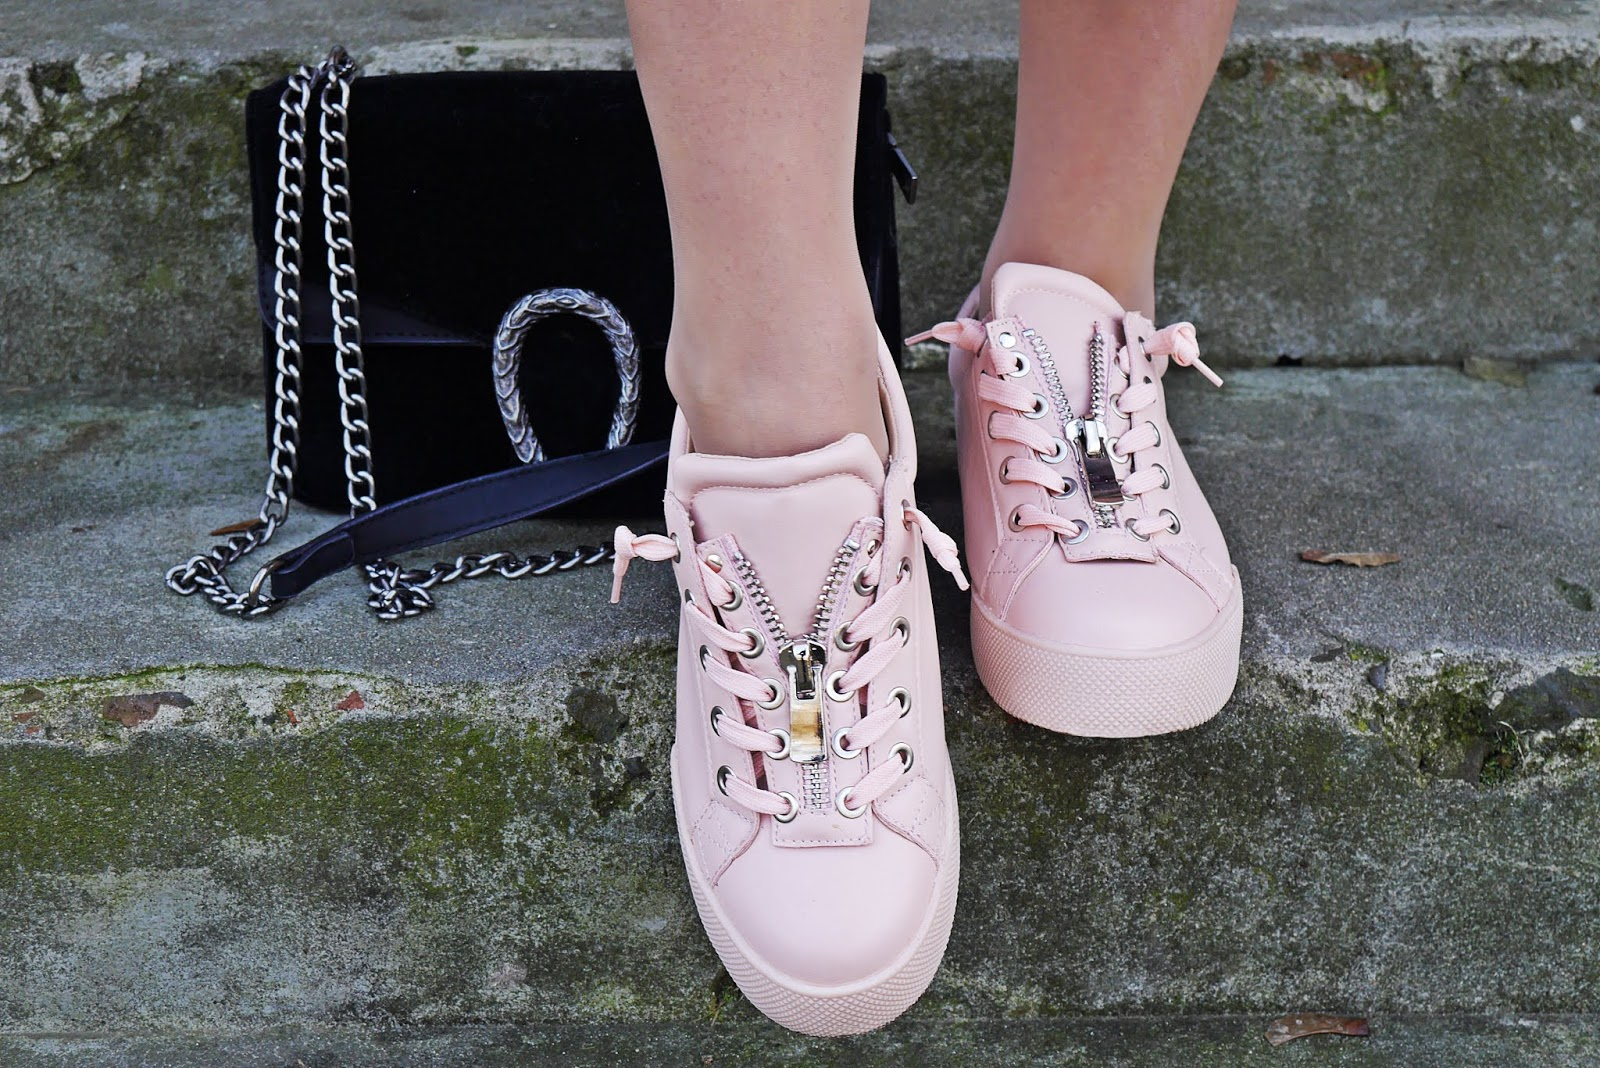 Różowe buty sneakersy renee kolorowa kamizelka czarna ramoneska karyn blog modowy blogerka modowa